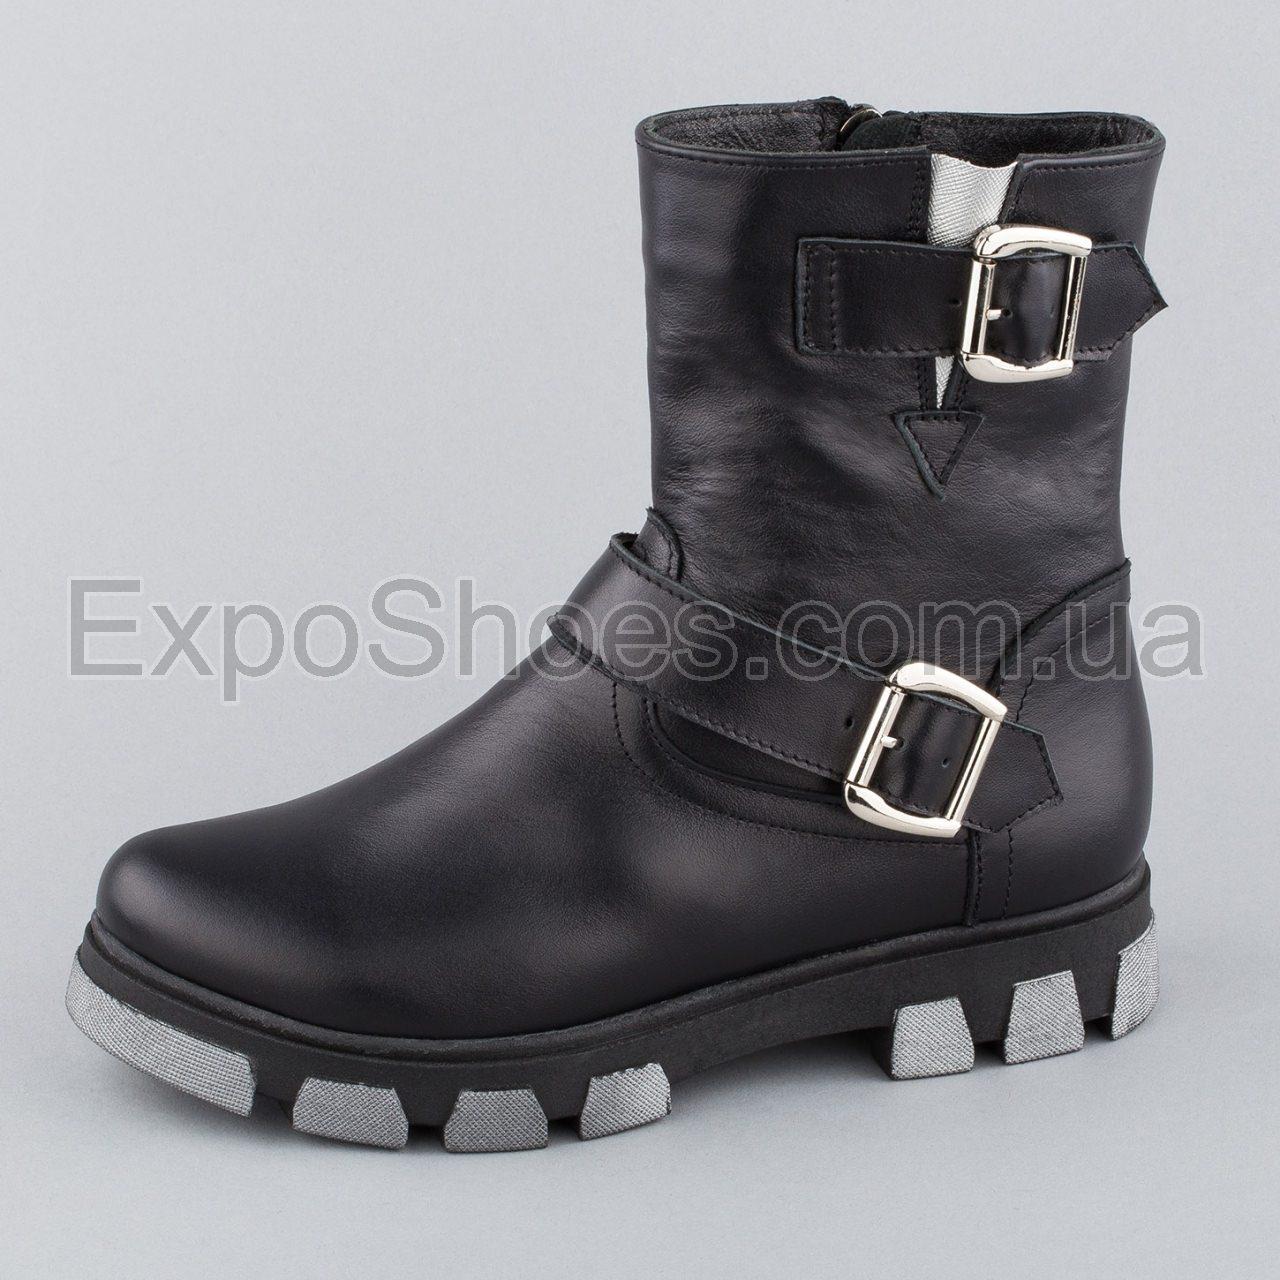 фото ботинок olimp